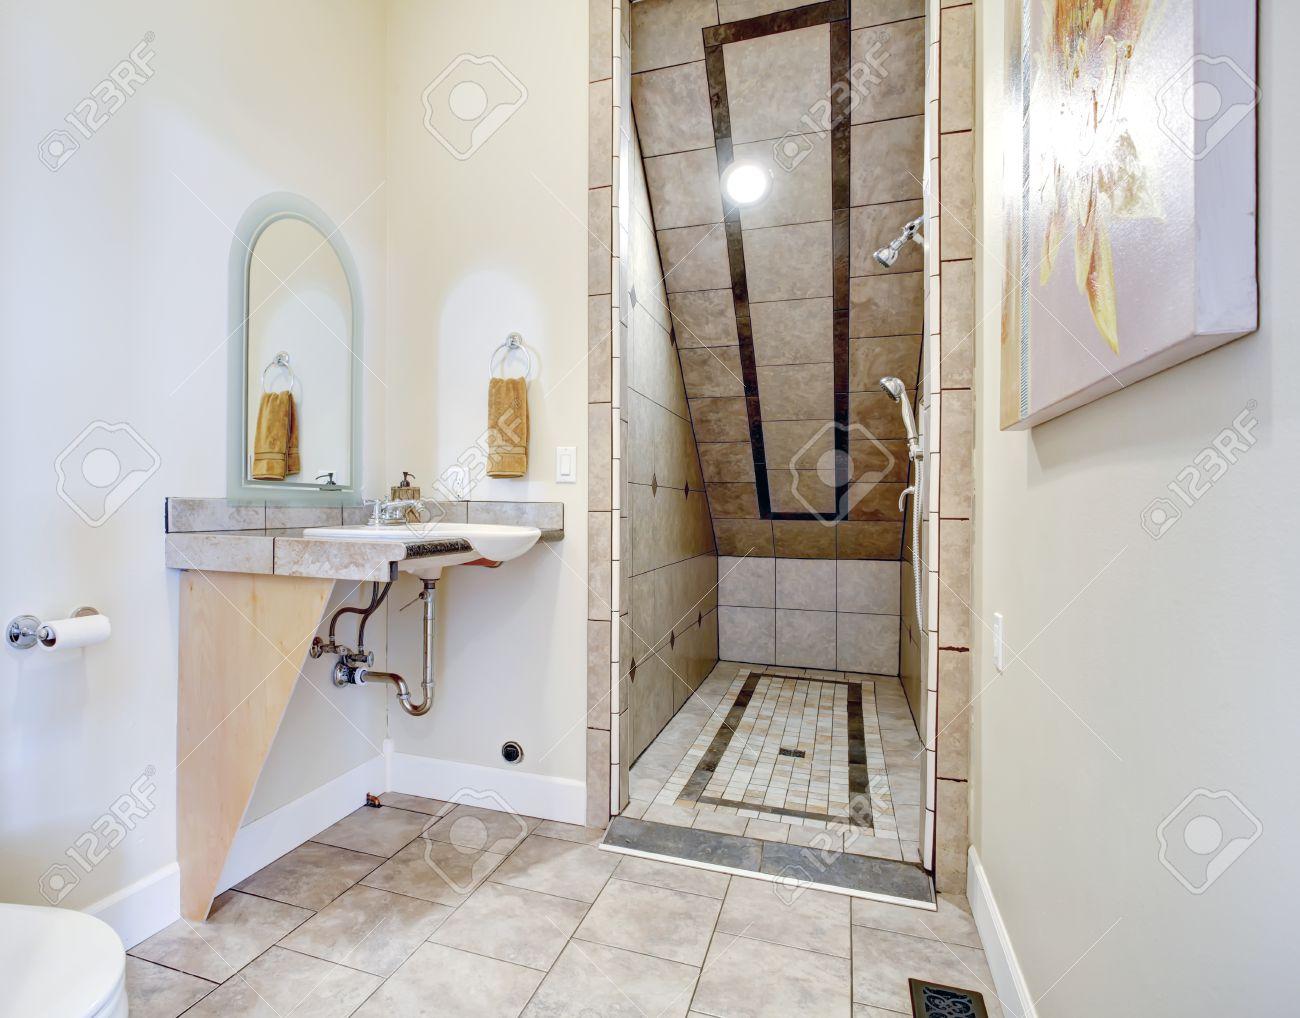 nl funvit plete badkamer met bad